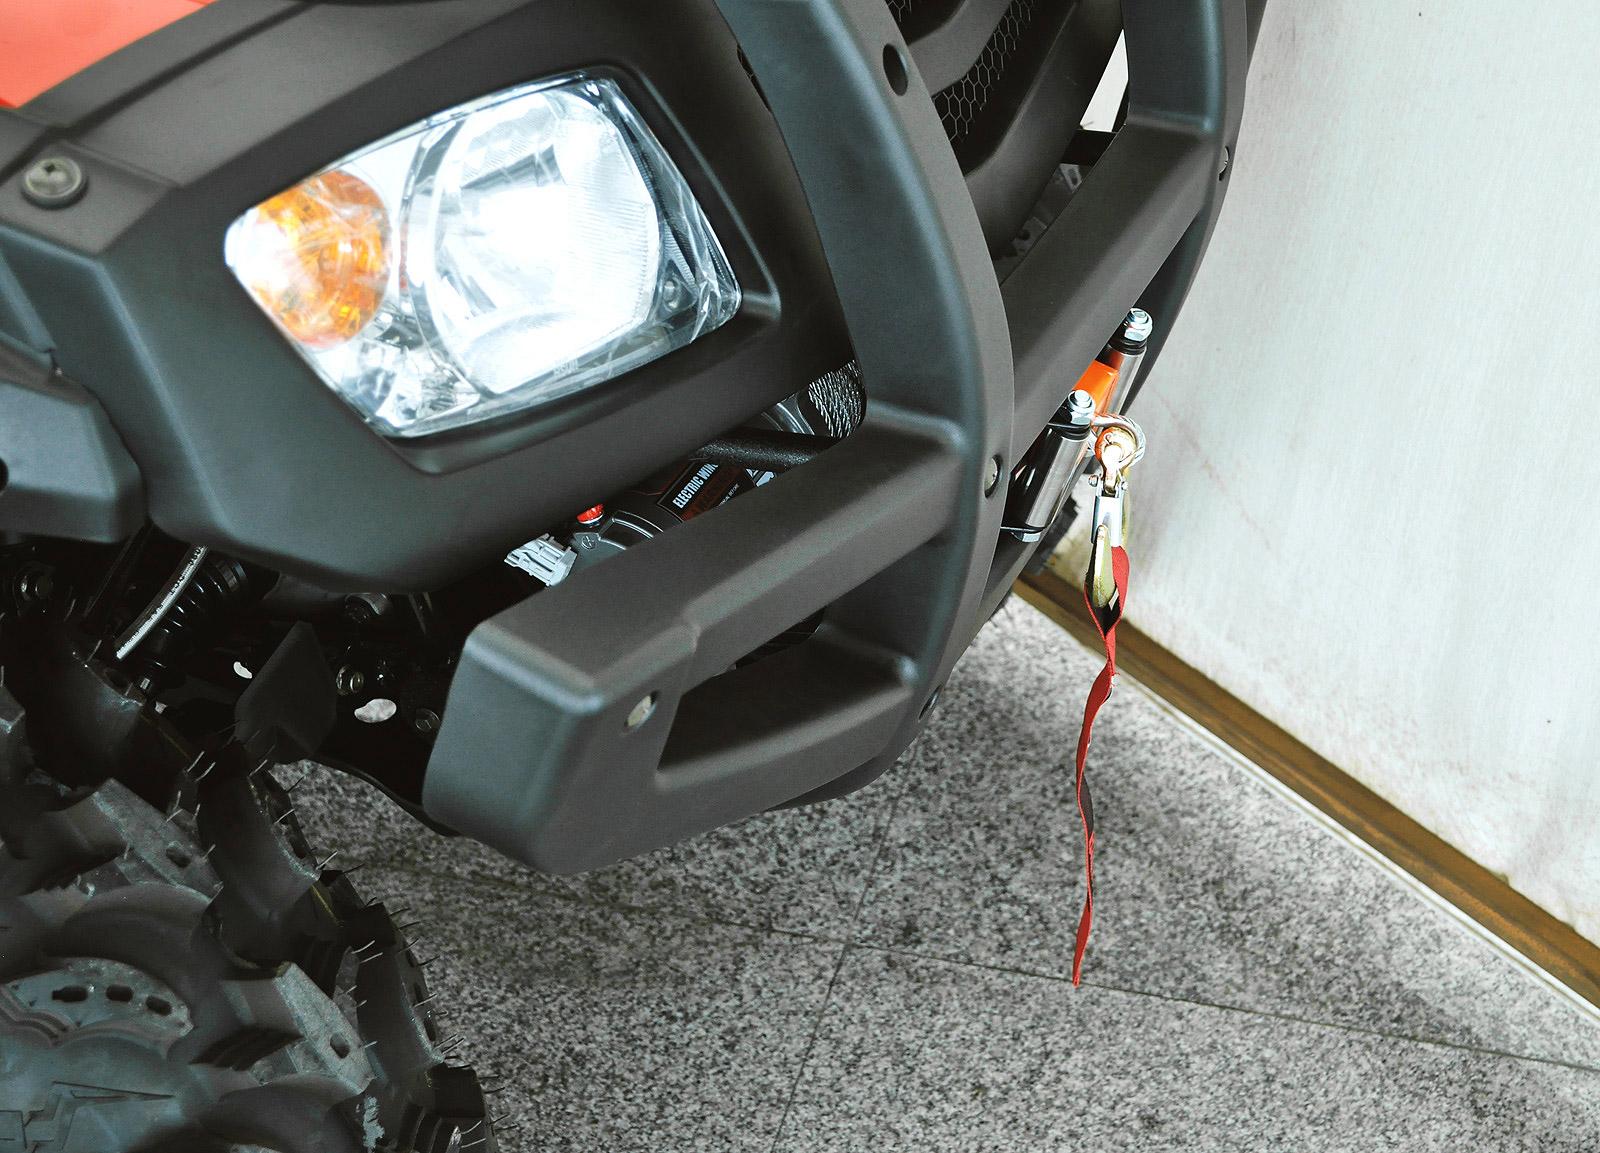 crossfire-territory-500-atv-quad-bike-front-headlight